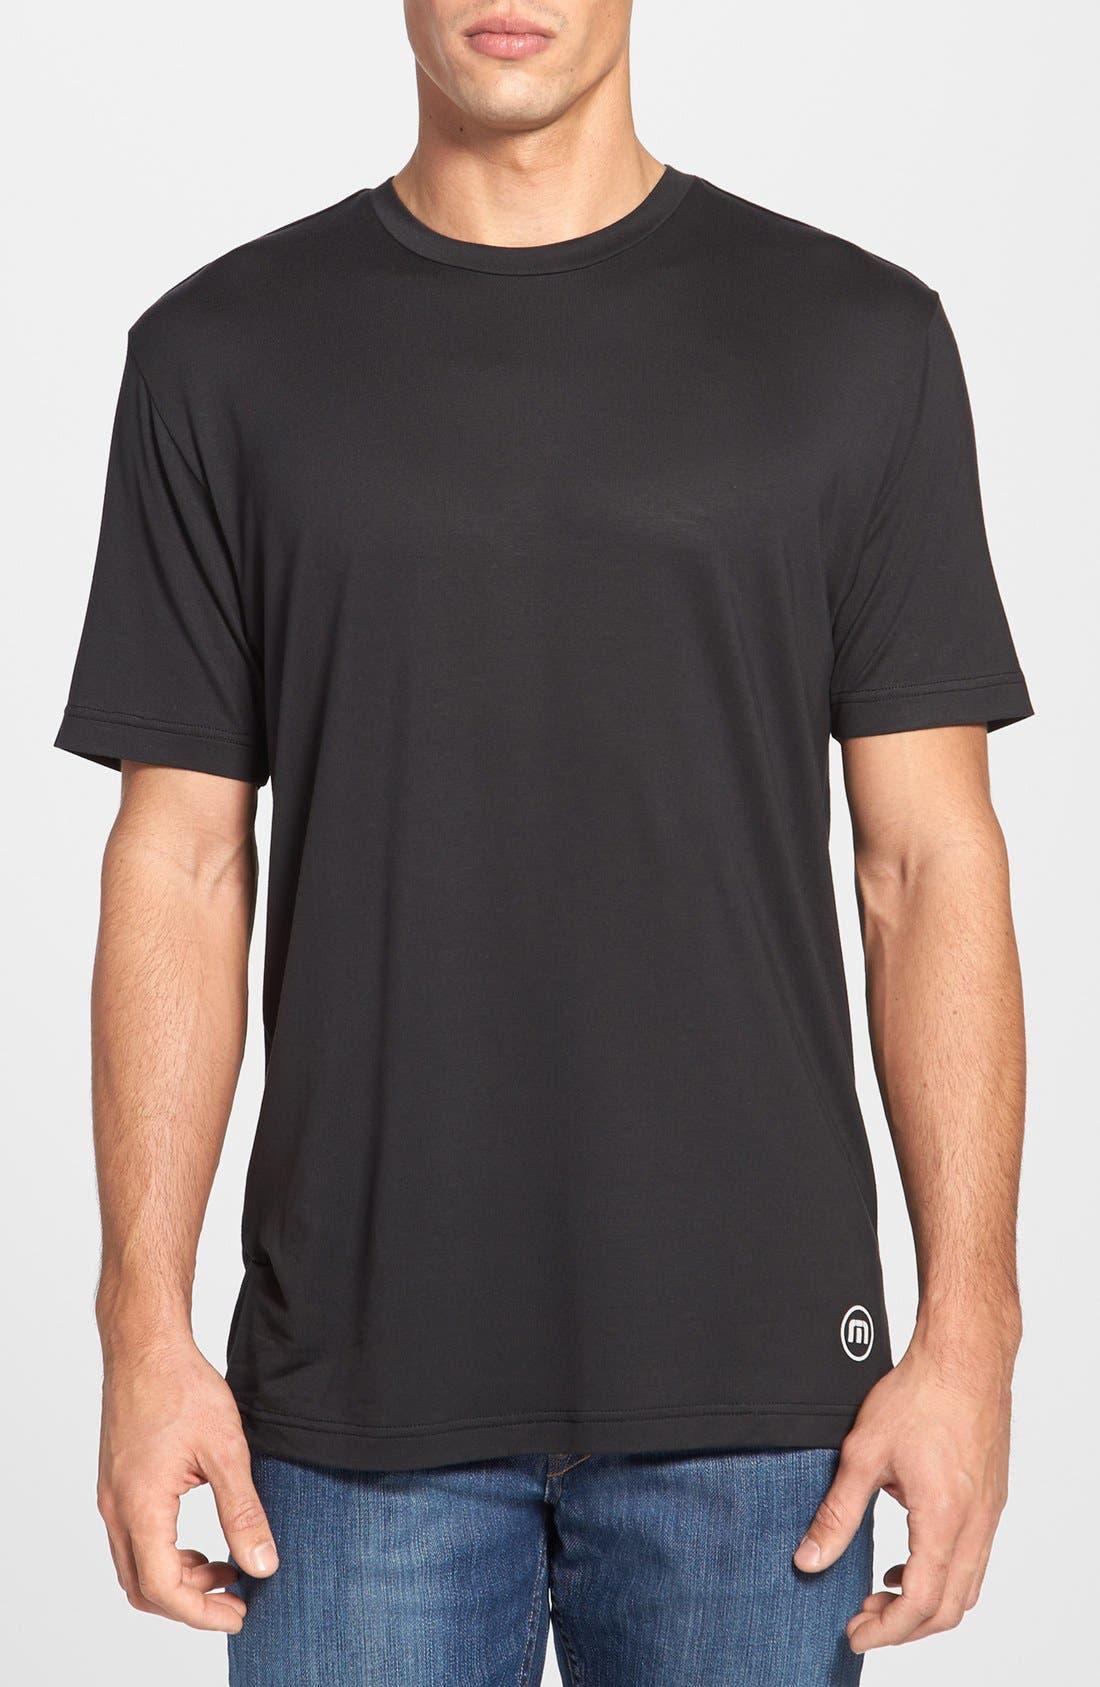 Alternate Image 1 Selected - Travis Mathew 'Upshall' Trim Fit T-Shirt